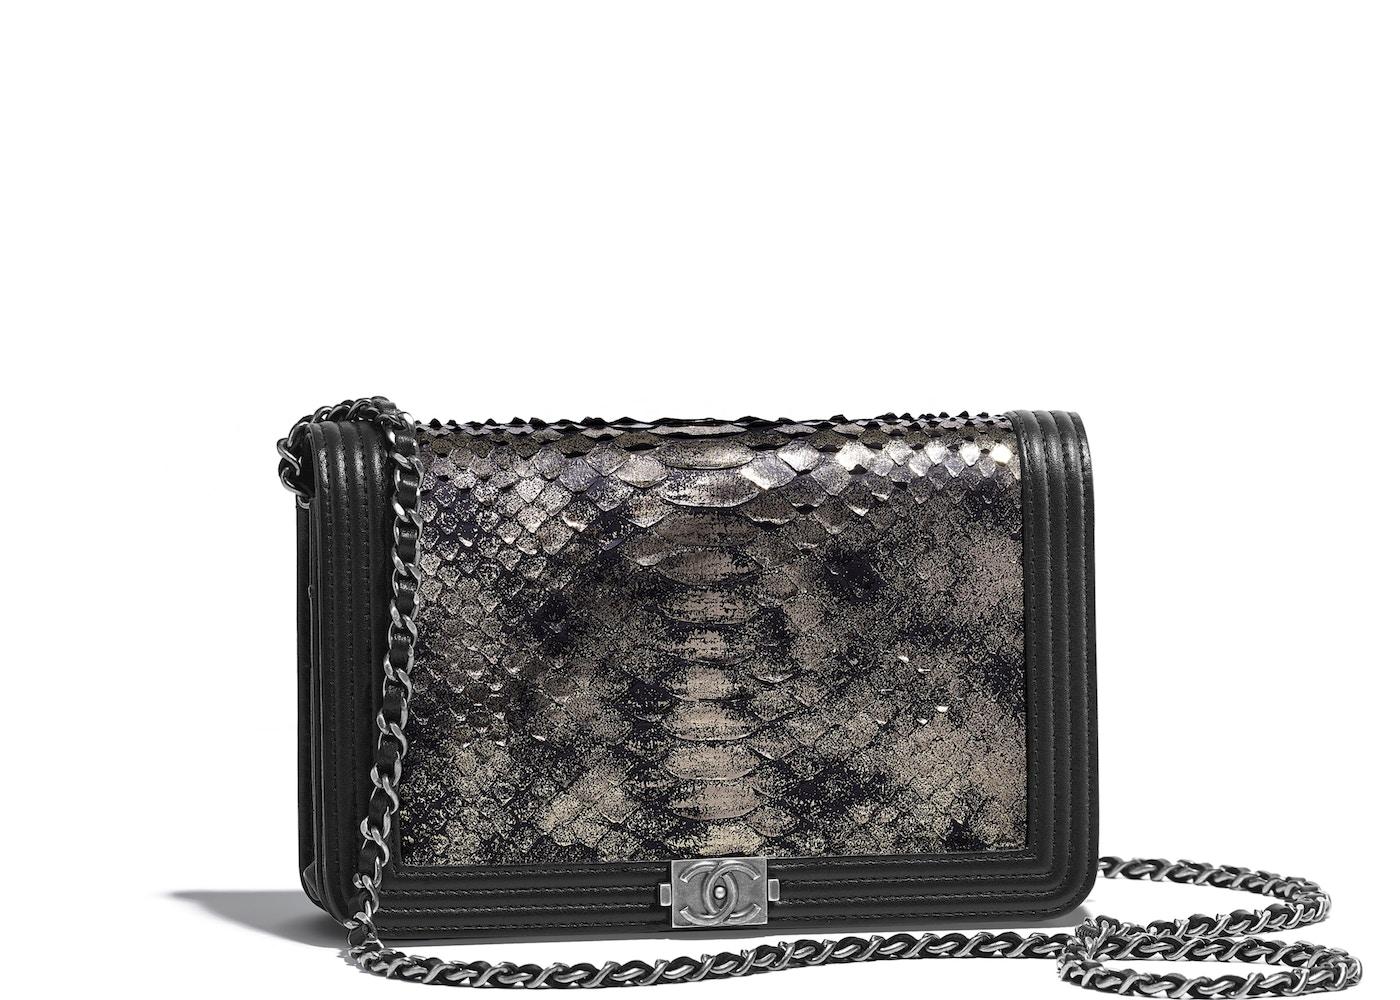 1923409efaed Chanel Boy Wallet On Chain Python Ruthenium-tone Silver/Black. Python  Ruthenium-tone Silver/Black